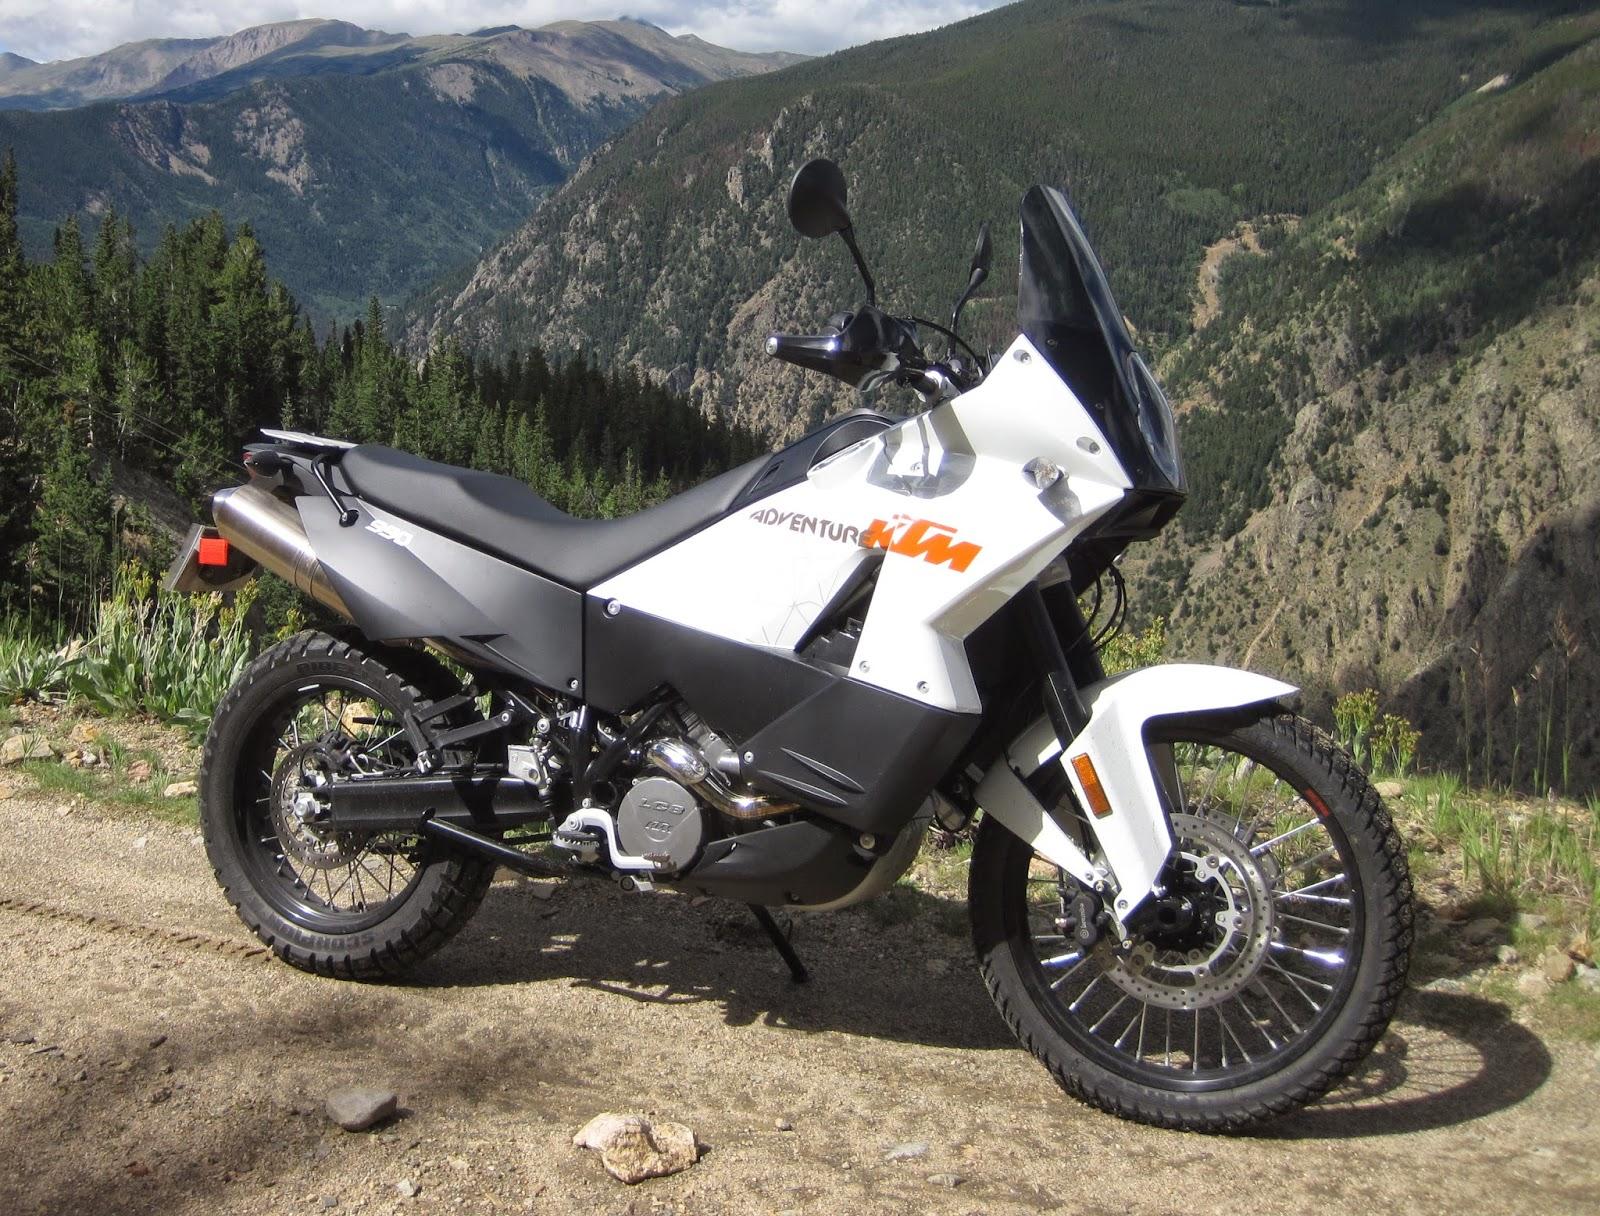 KTM 950 Adventure S Bikes Price